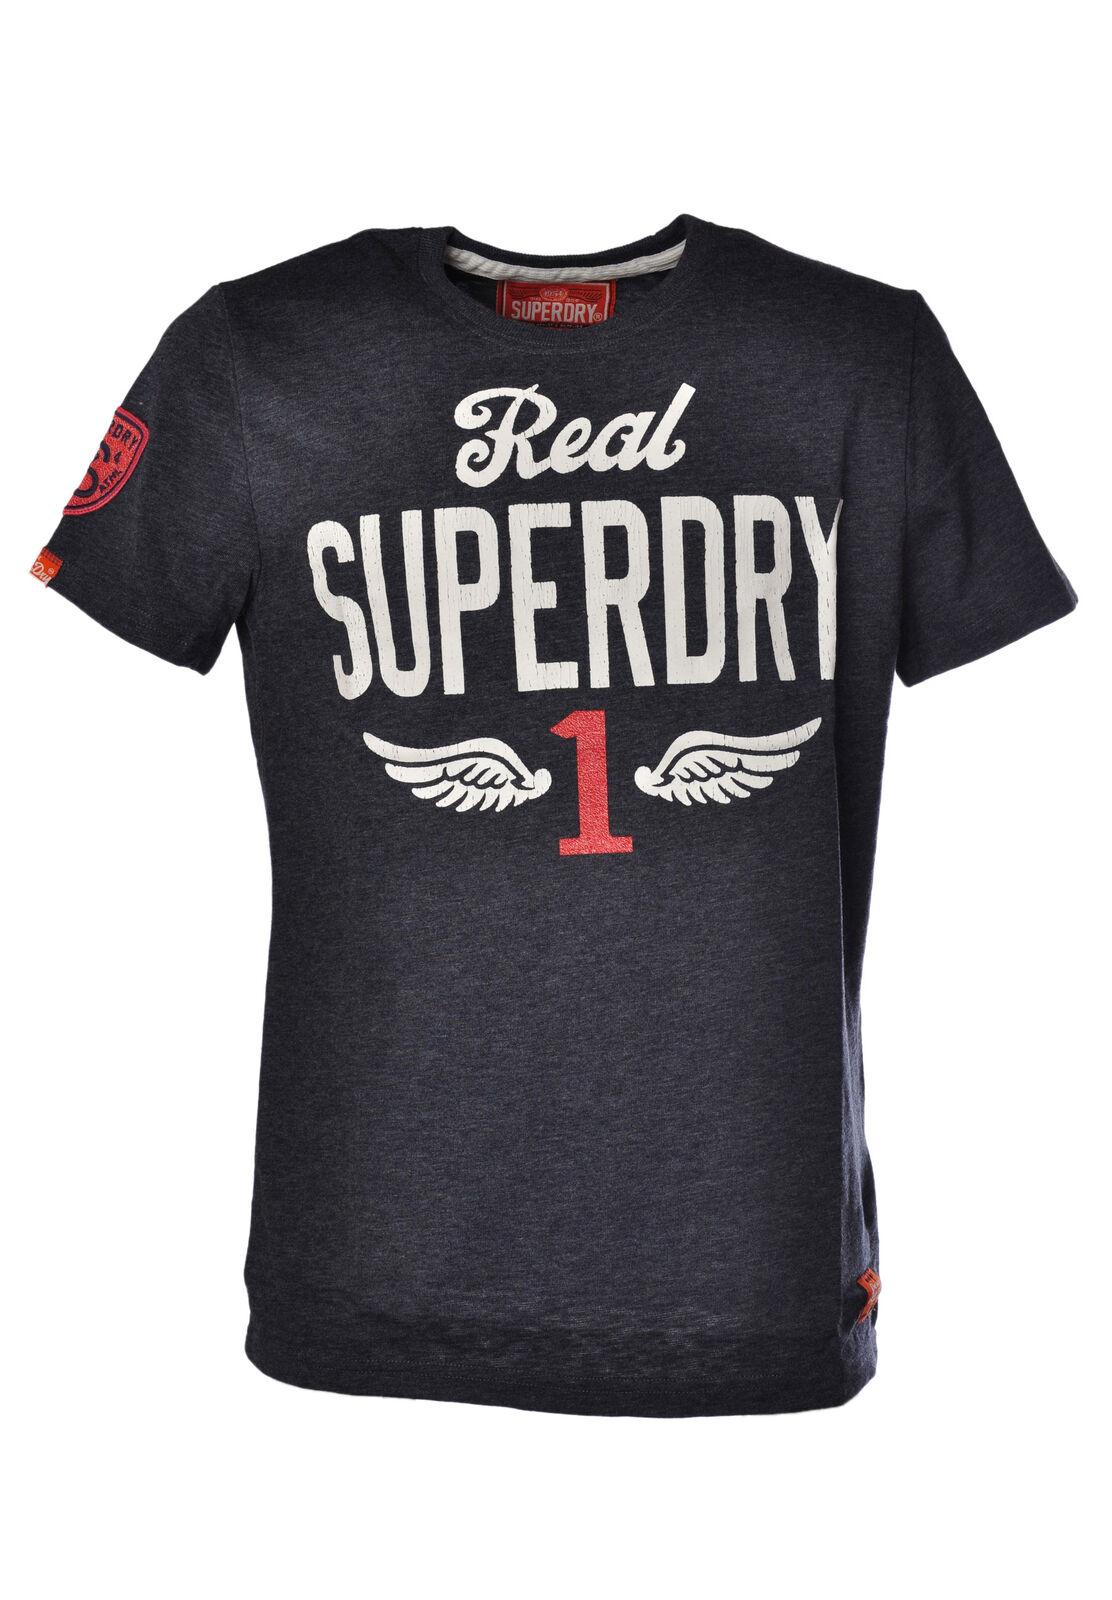 Superdry - Topwear-T-shirts - Man - Blau - 1035018C184444